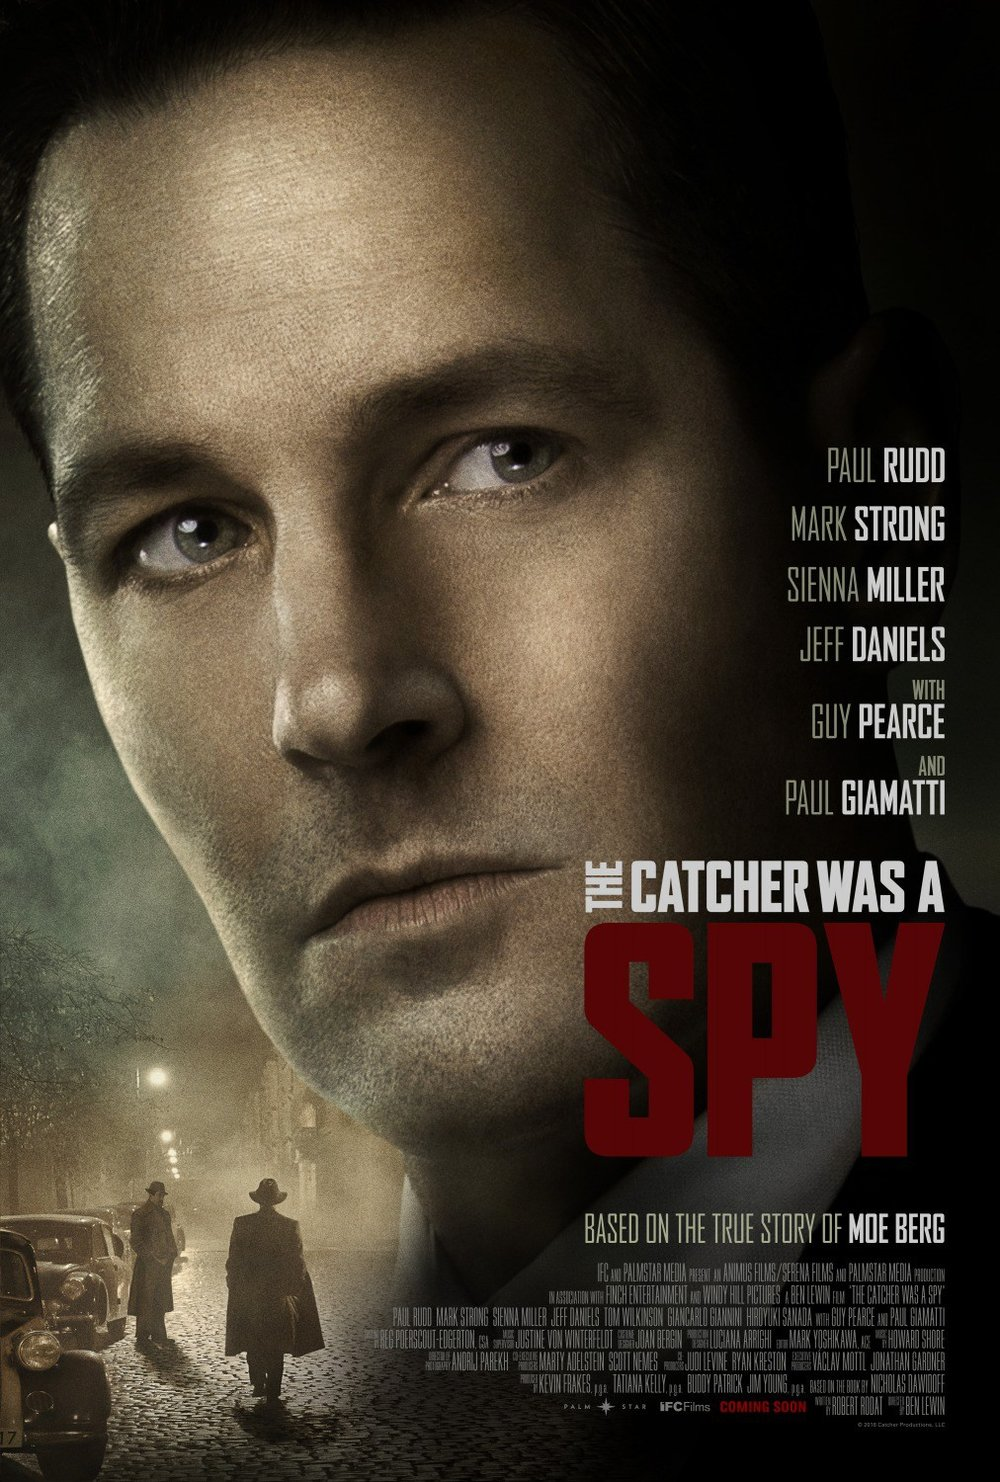 The-Catcher-Was-A-Spy-Movie-Poster.jpg